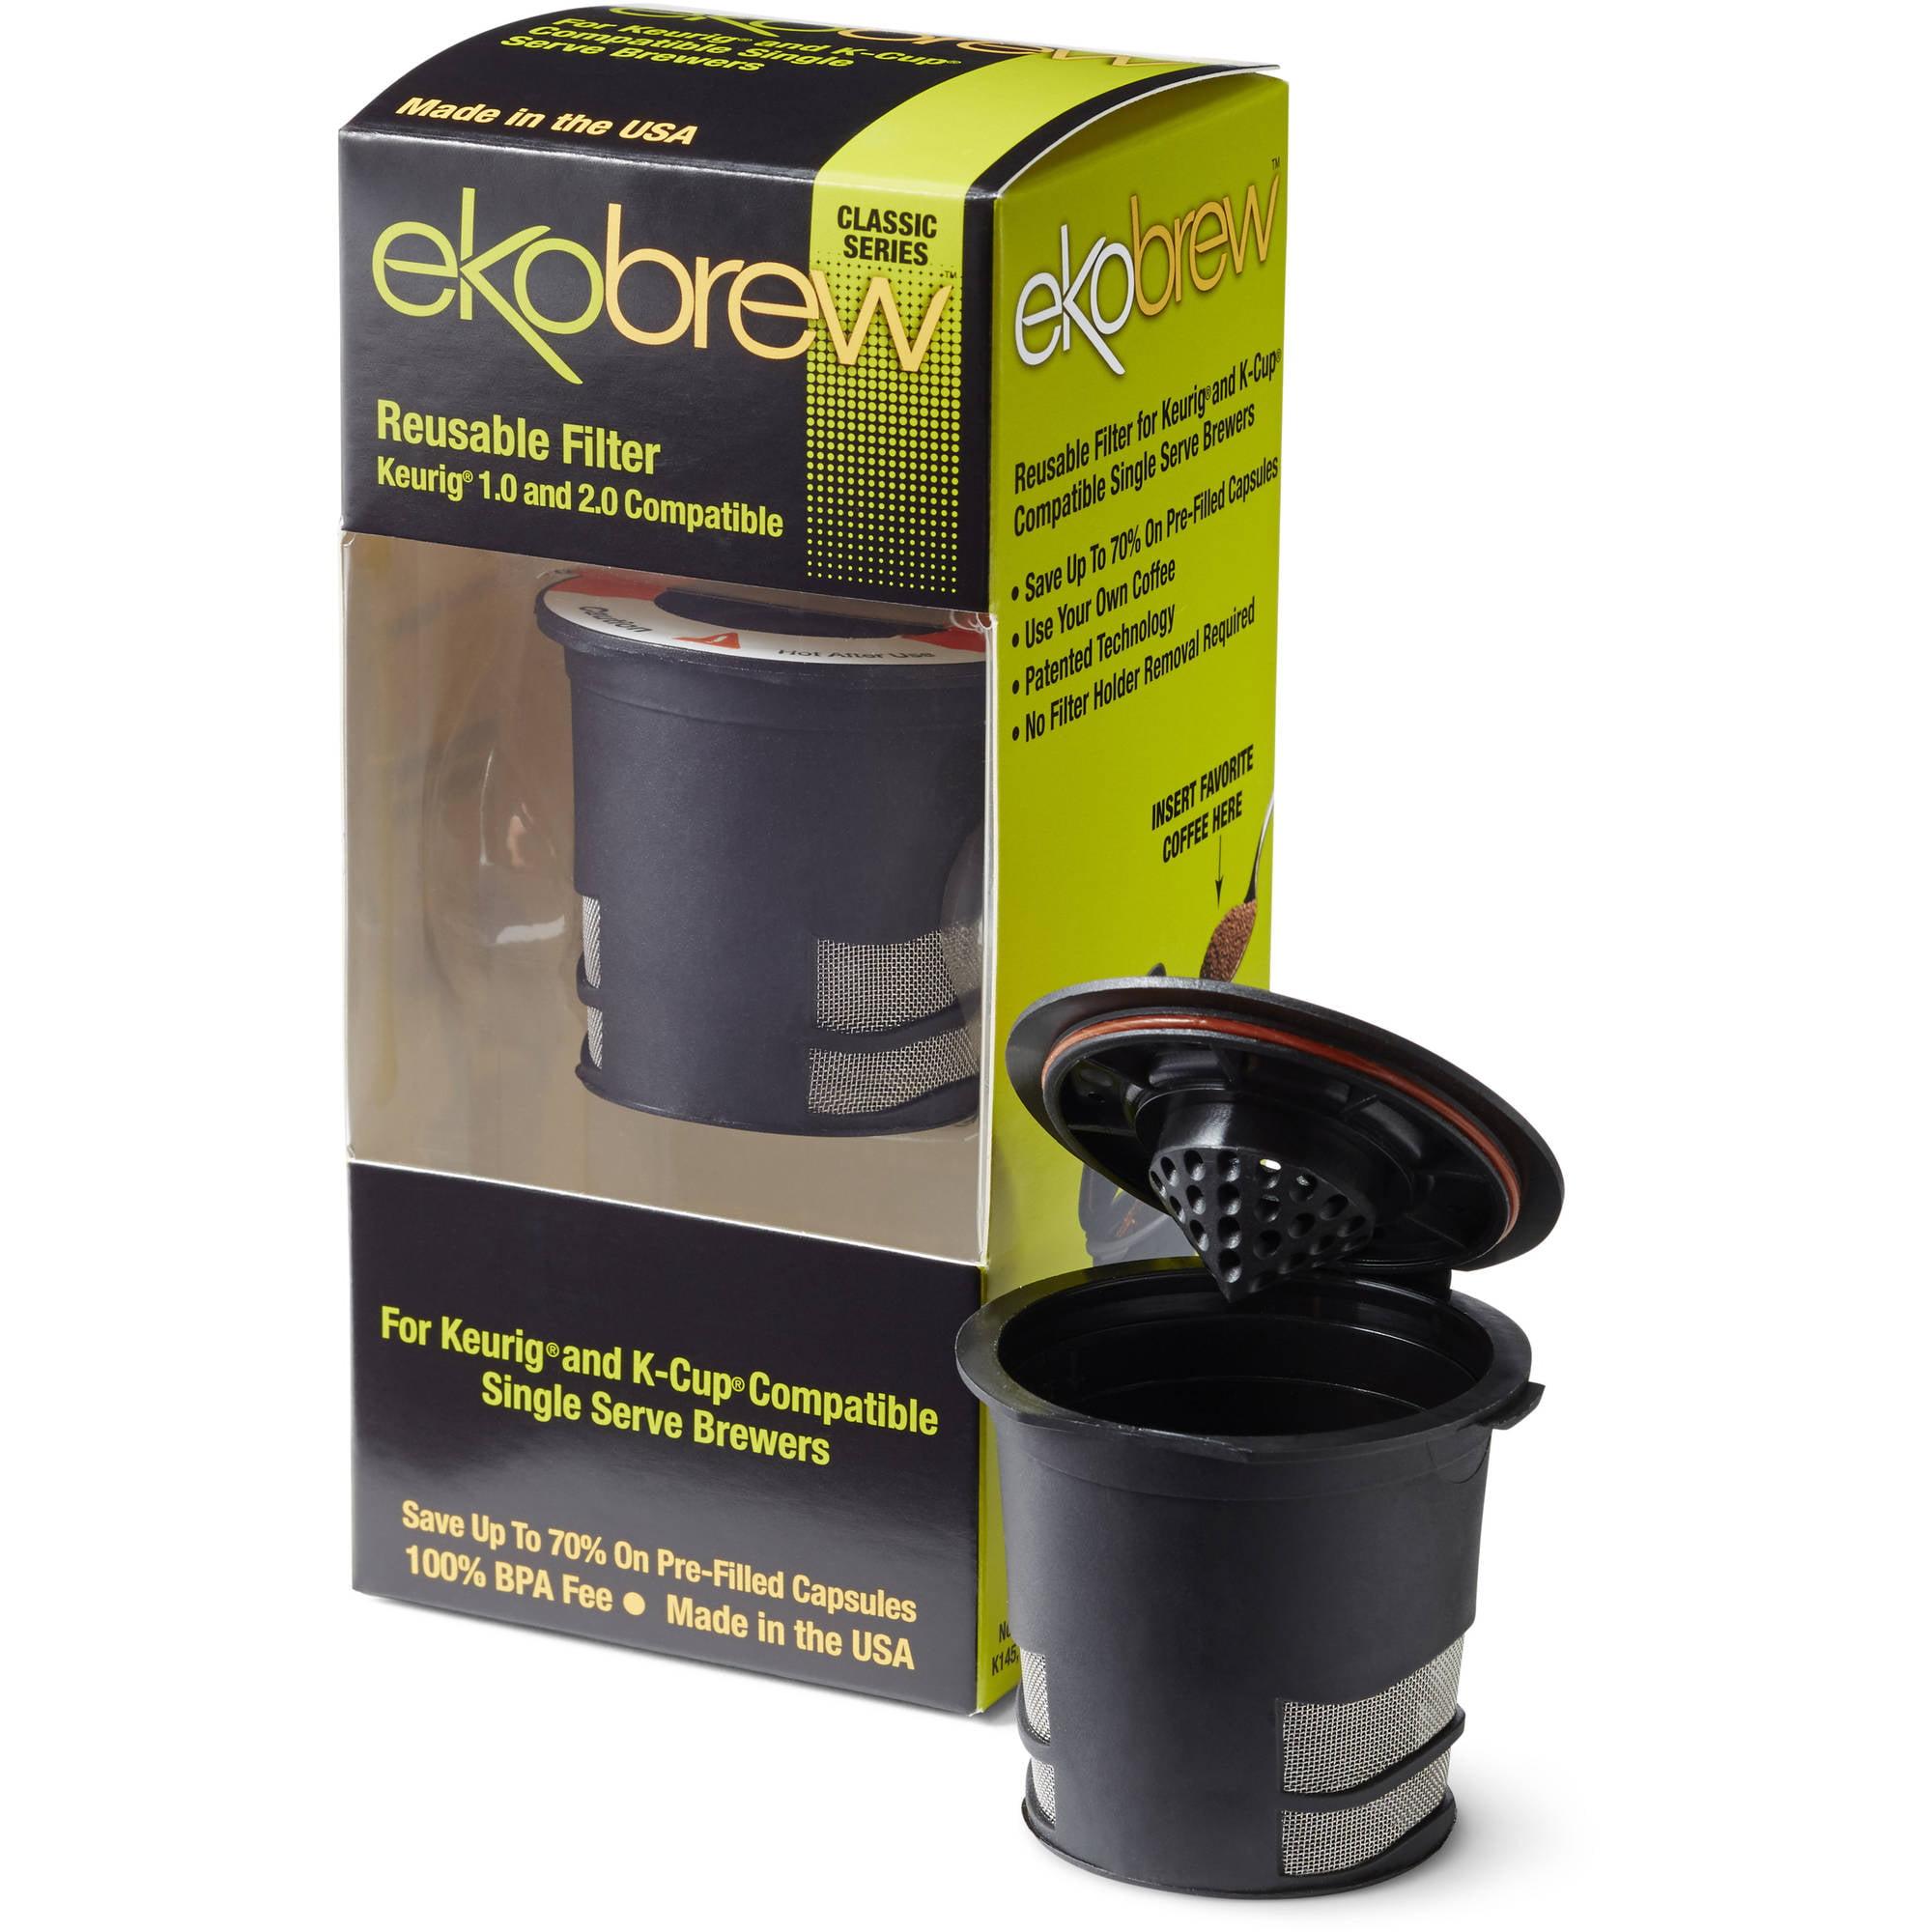 Ekobrew 2.0 K Cup Reusable Coffee Filter, Black Reusable Filter